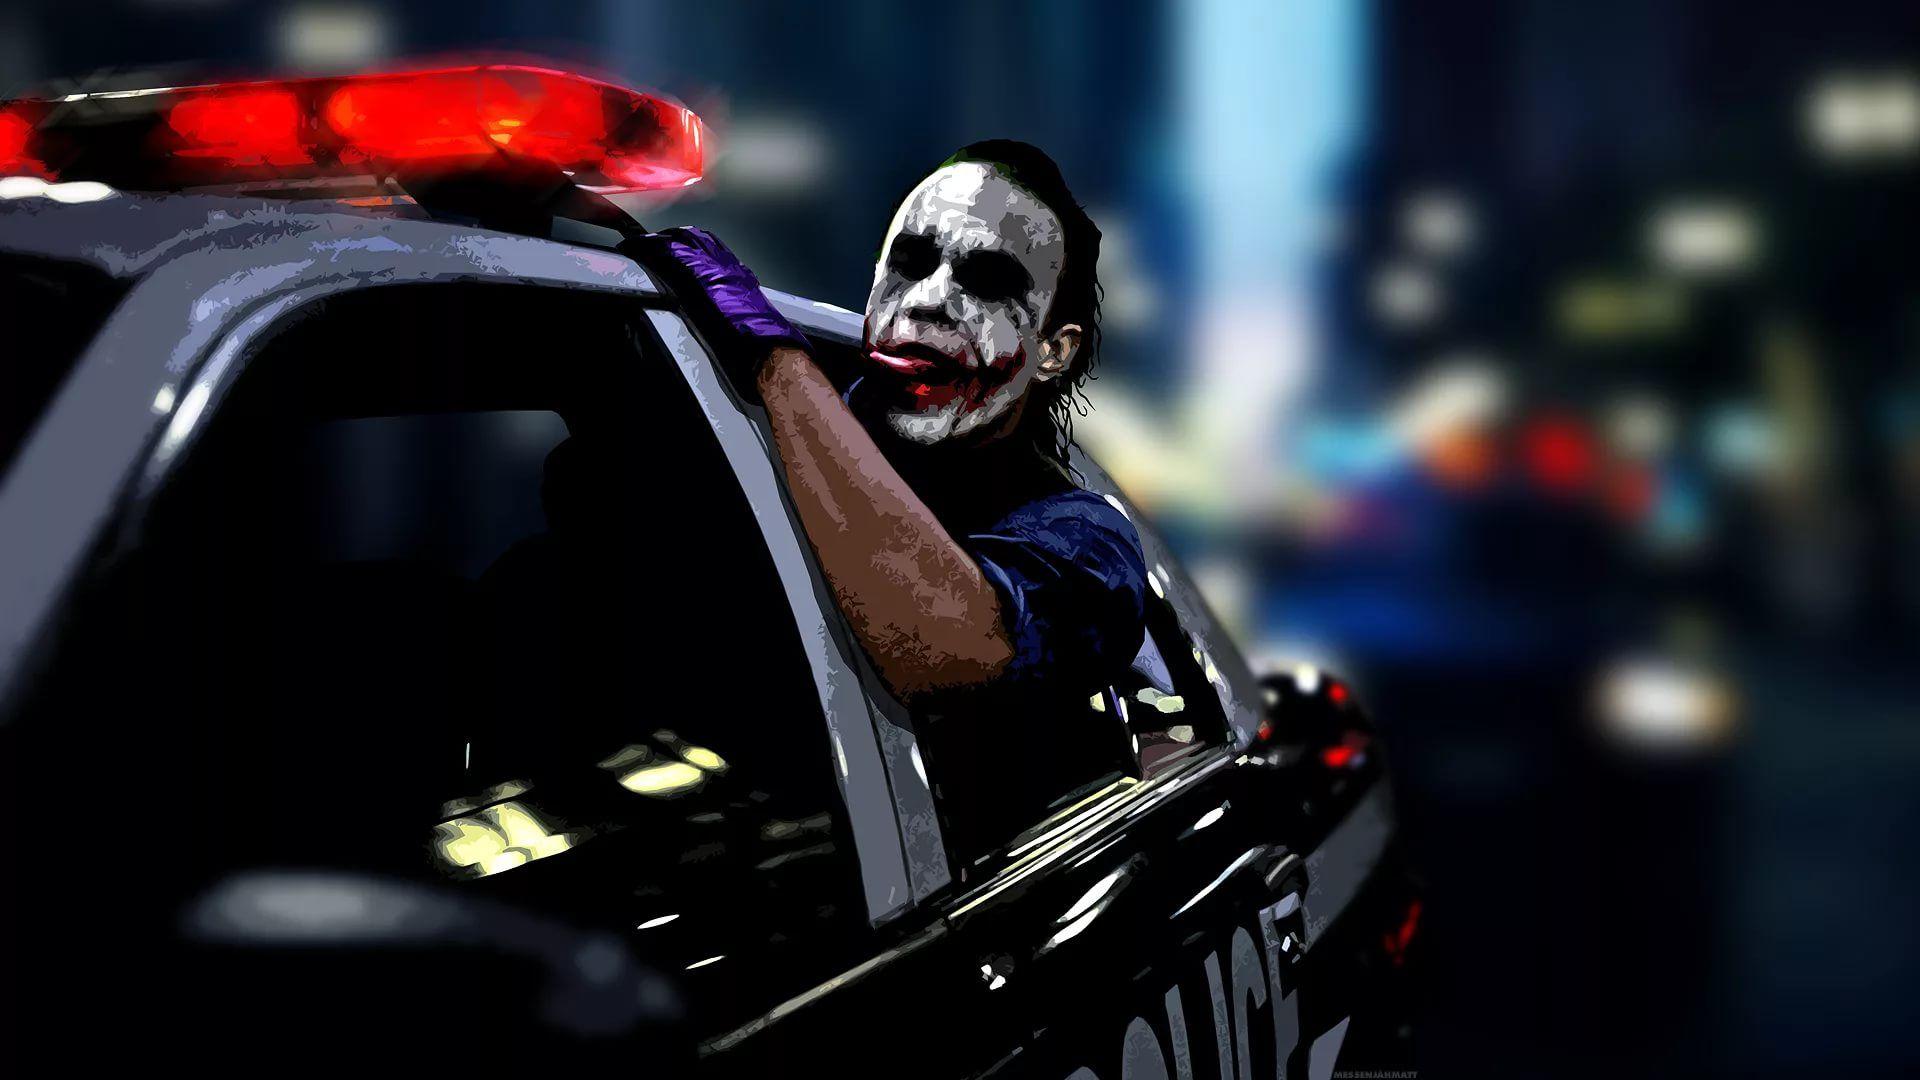 Police best Wallpaper